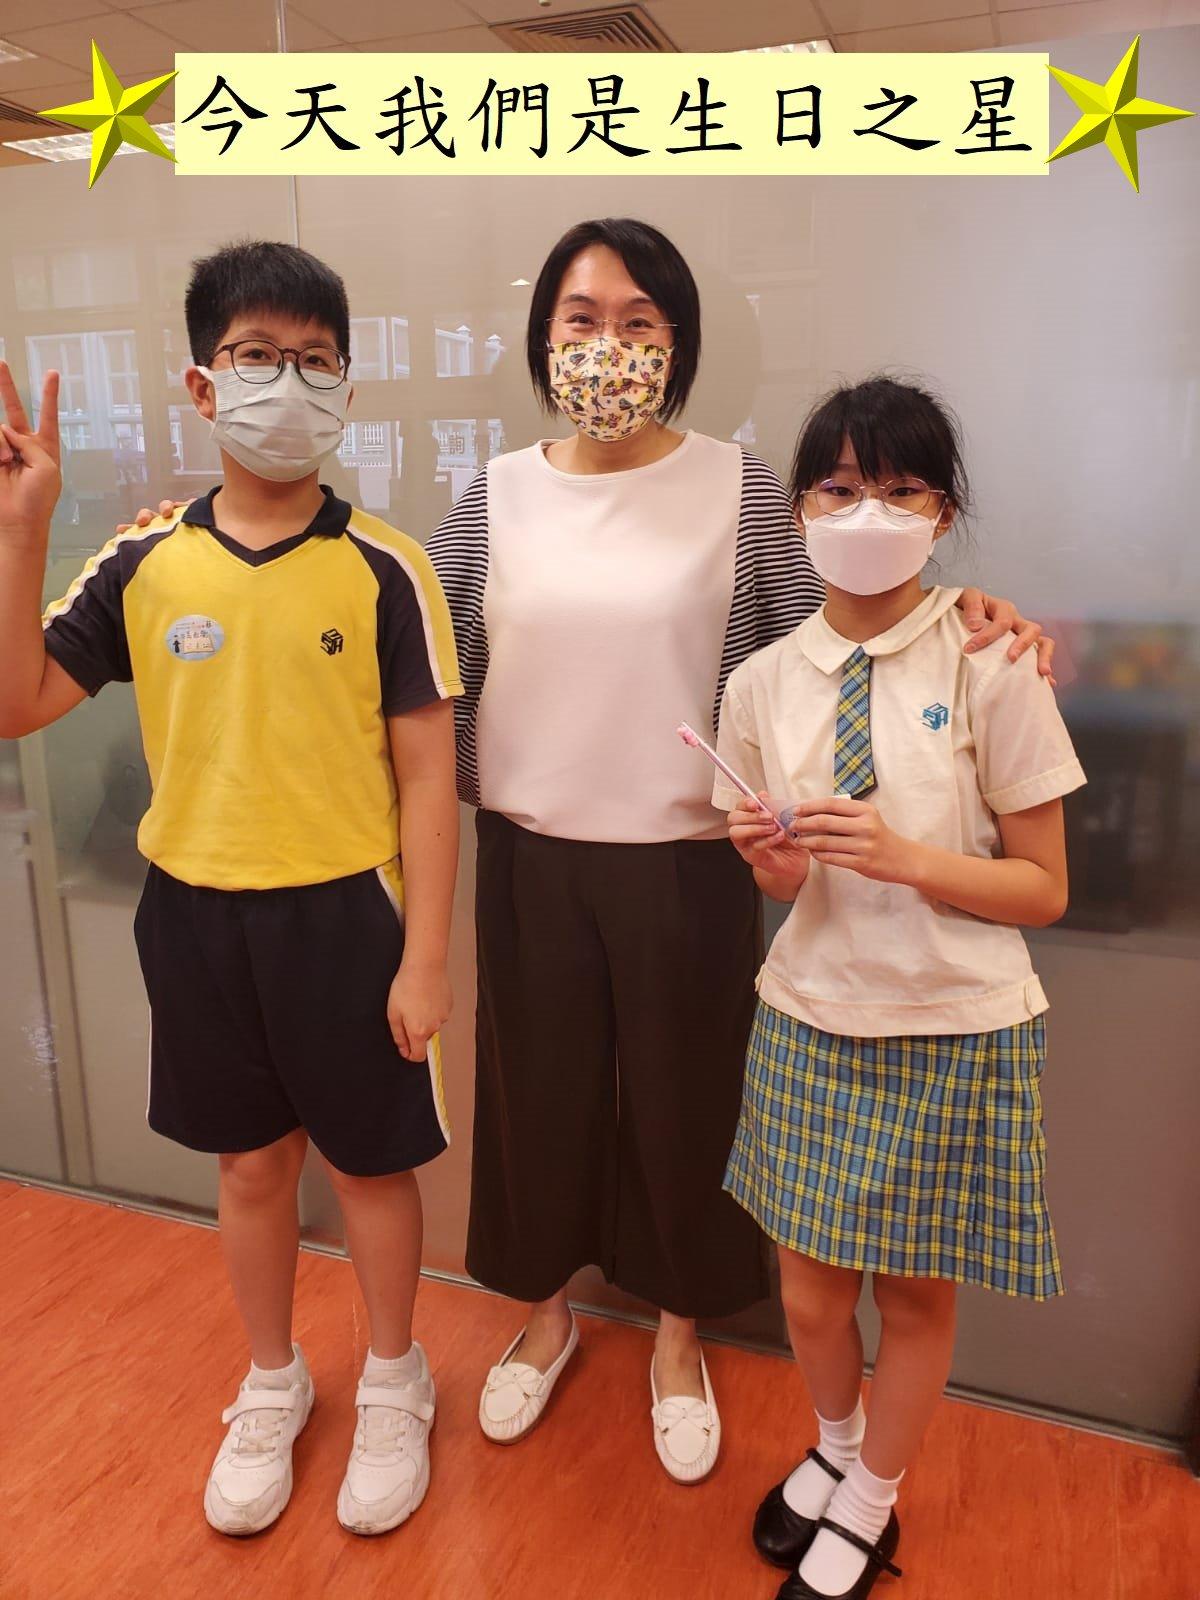 https://syh.edu.hk/sites/default/files/whatsapp_image_2021-07-09_at_14.43.10_1.jpeg